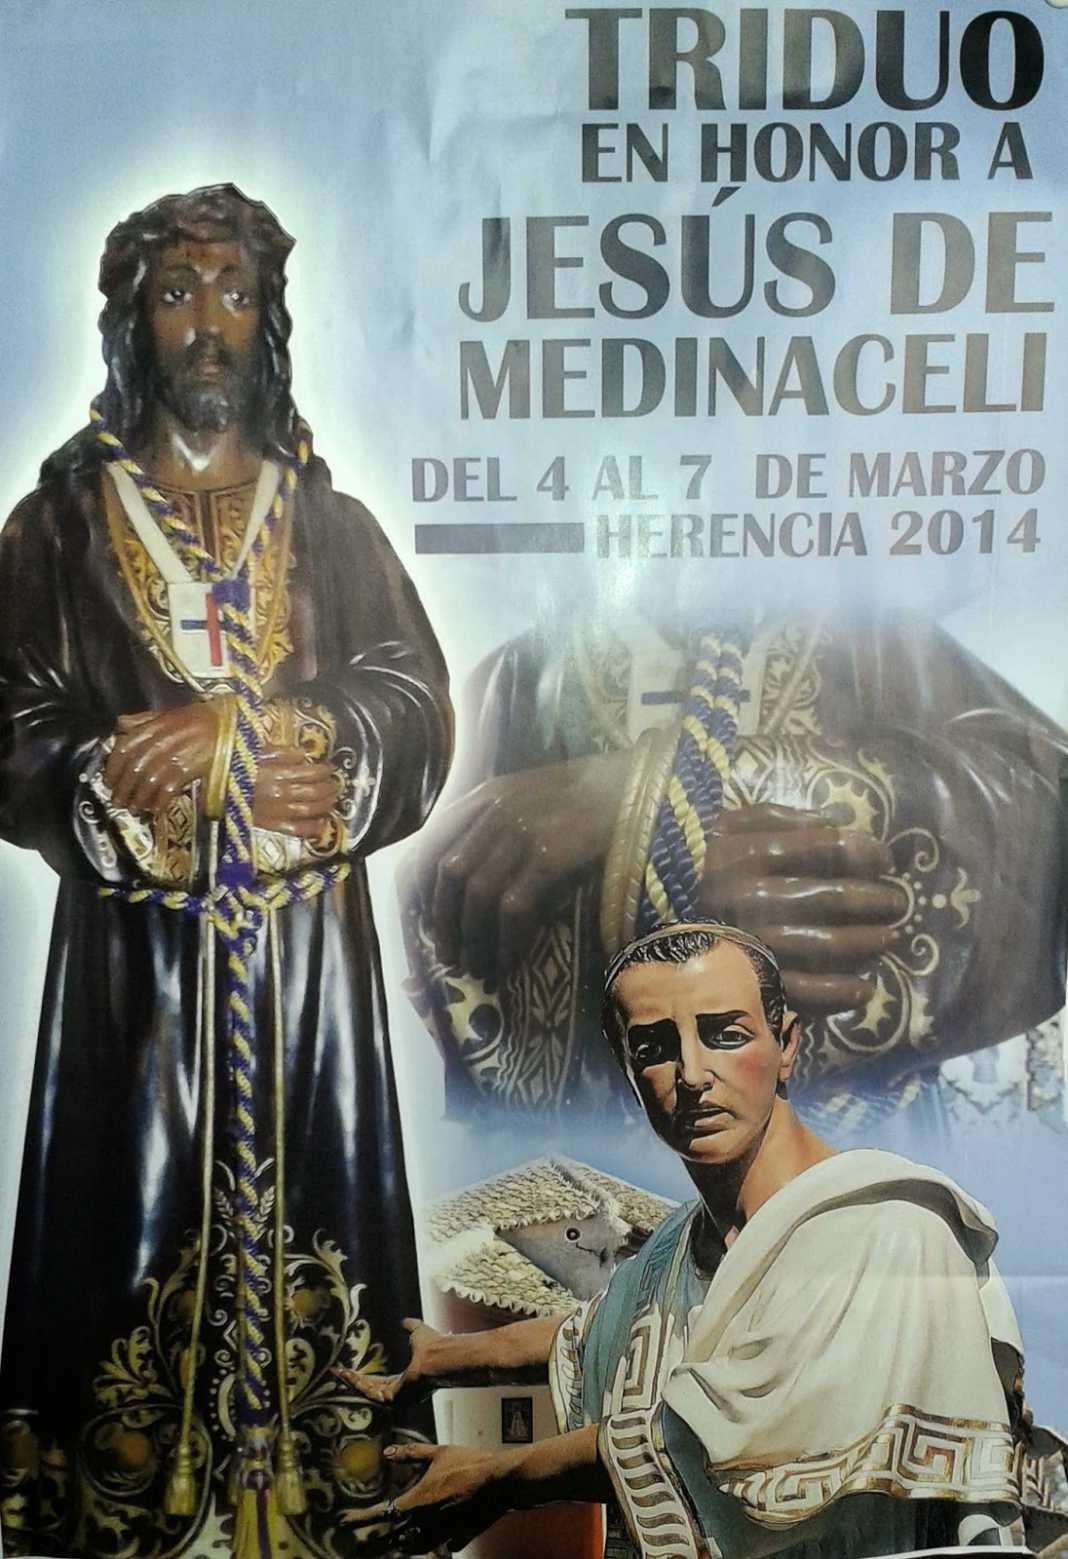 Triduo en honor a Jesús de Medinaceli 1068x1559 - Triduo en honor a Jesús de Medinaceli